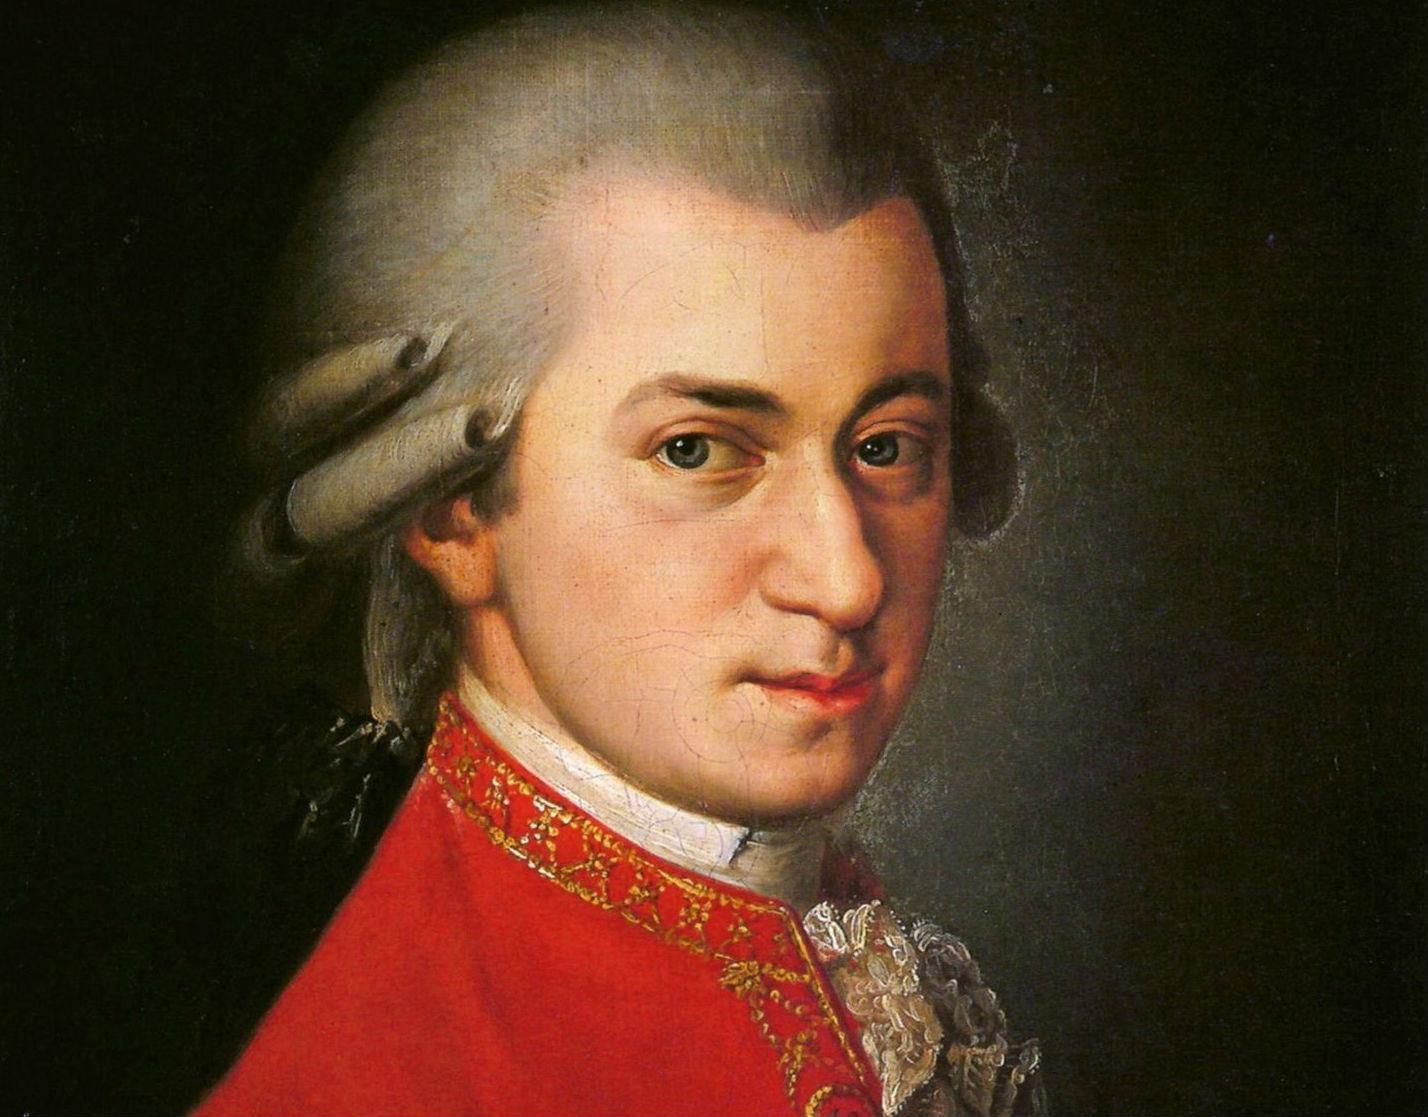 The 20 Essential Mozart Recordings | WQXR | New York's Classical Music Radio Station